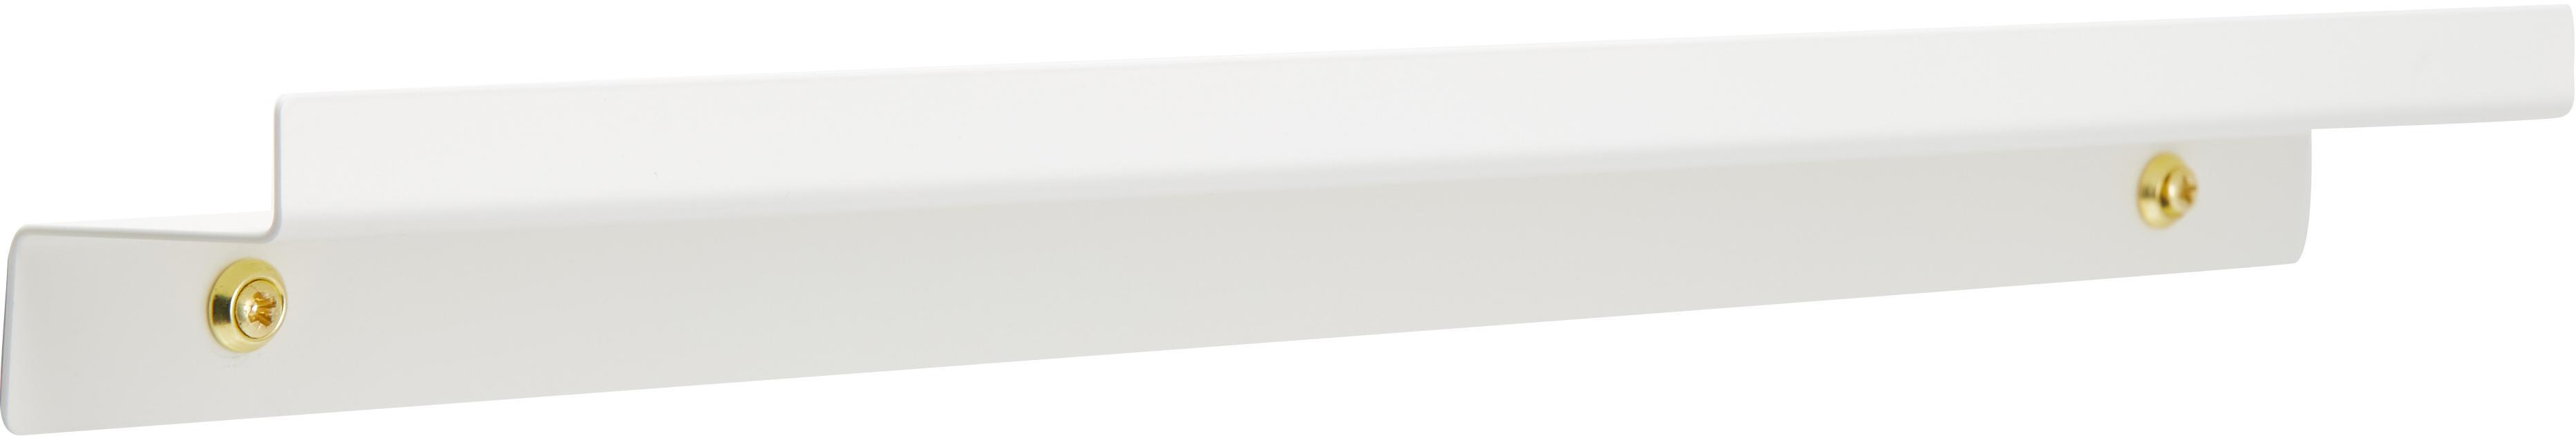 Estante estrecho para cuadros Shelfini blanco, Estante: metal, pintado, Blanco, latón, An 50 x Al 6 cm